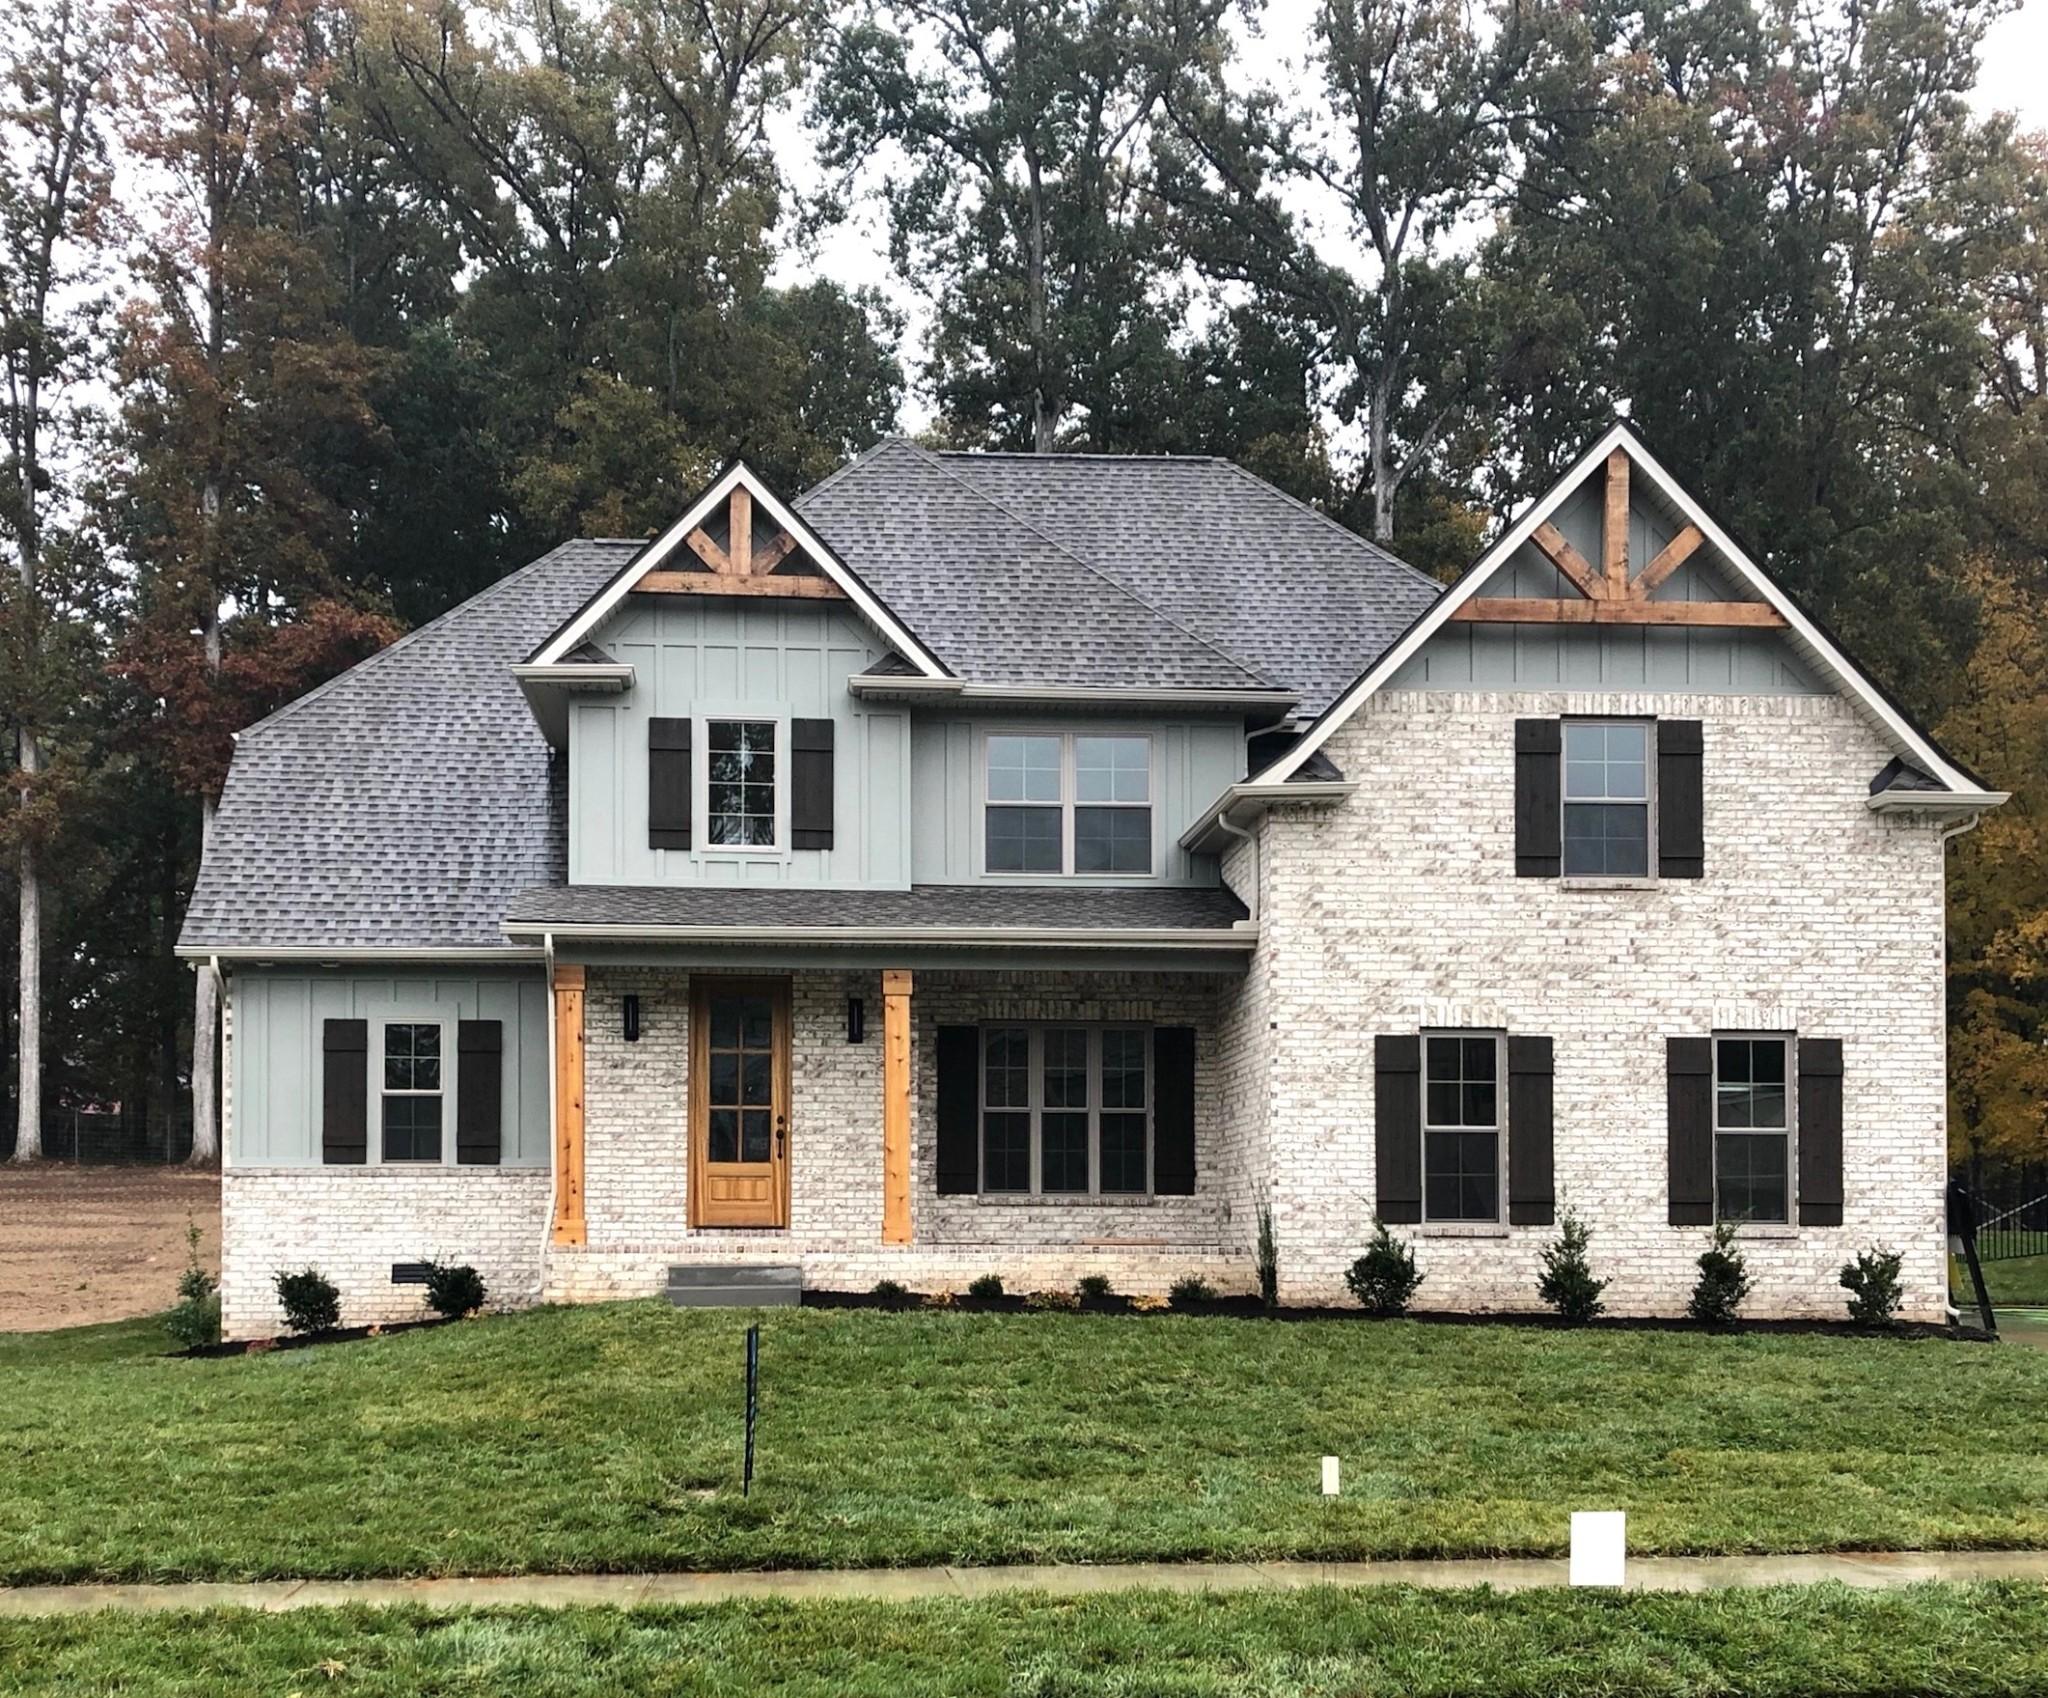 475 Shea's Way , Clarksville, TN 37043 - Clarksville, TN real estate listing